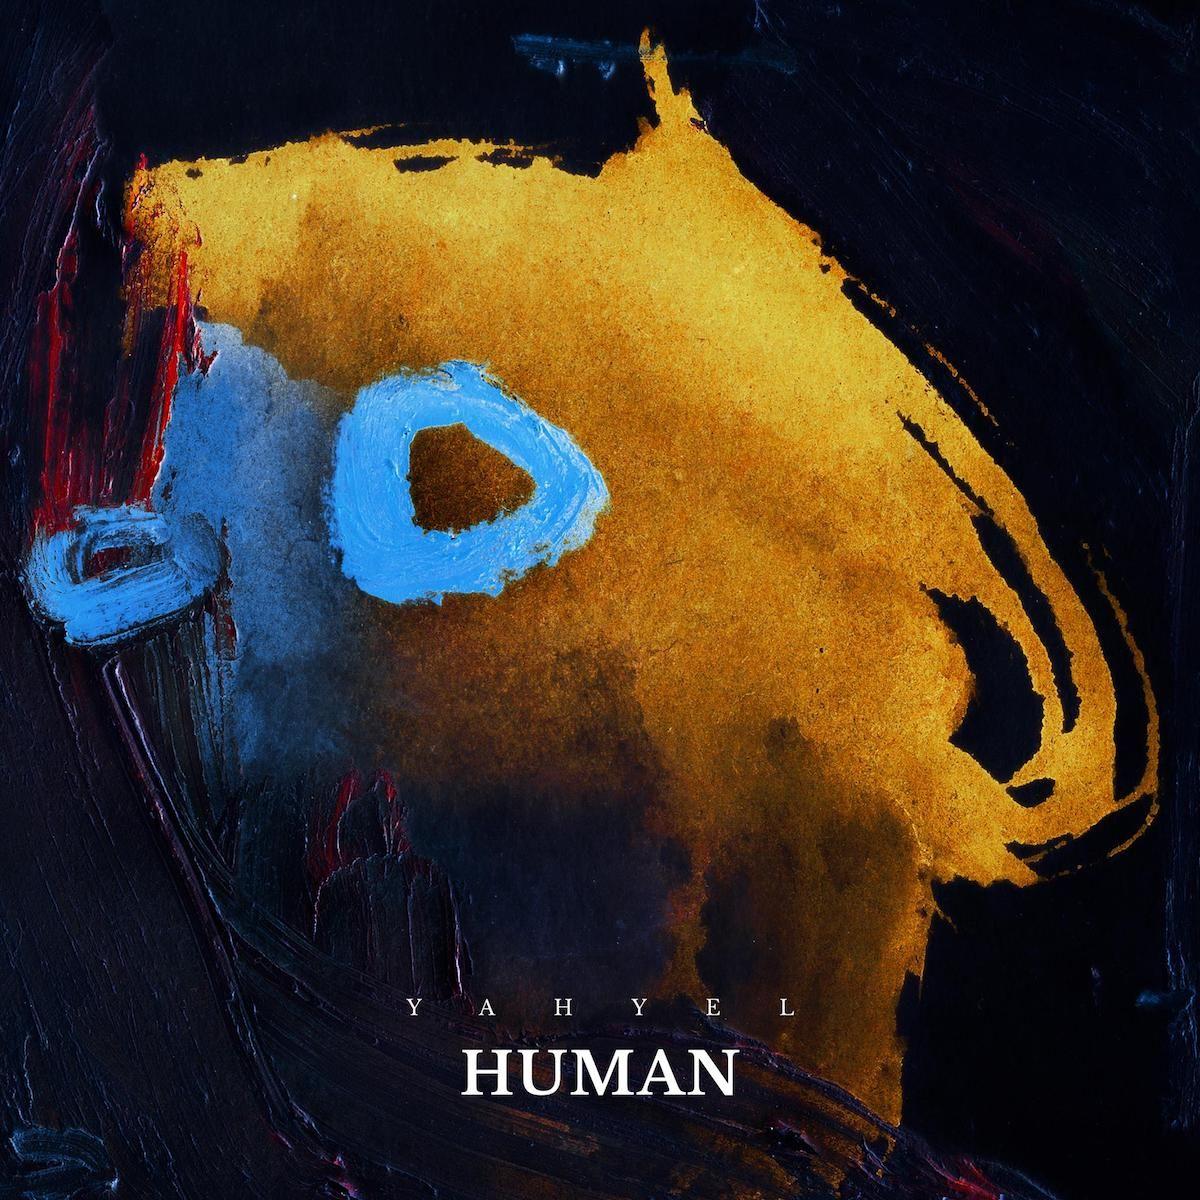 yahyel・池貝峻&篠田ミルの解説で読み解く、最新アルバム『Human』 Yahyel_Human_Cover_3000web-1200x1200